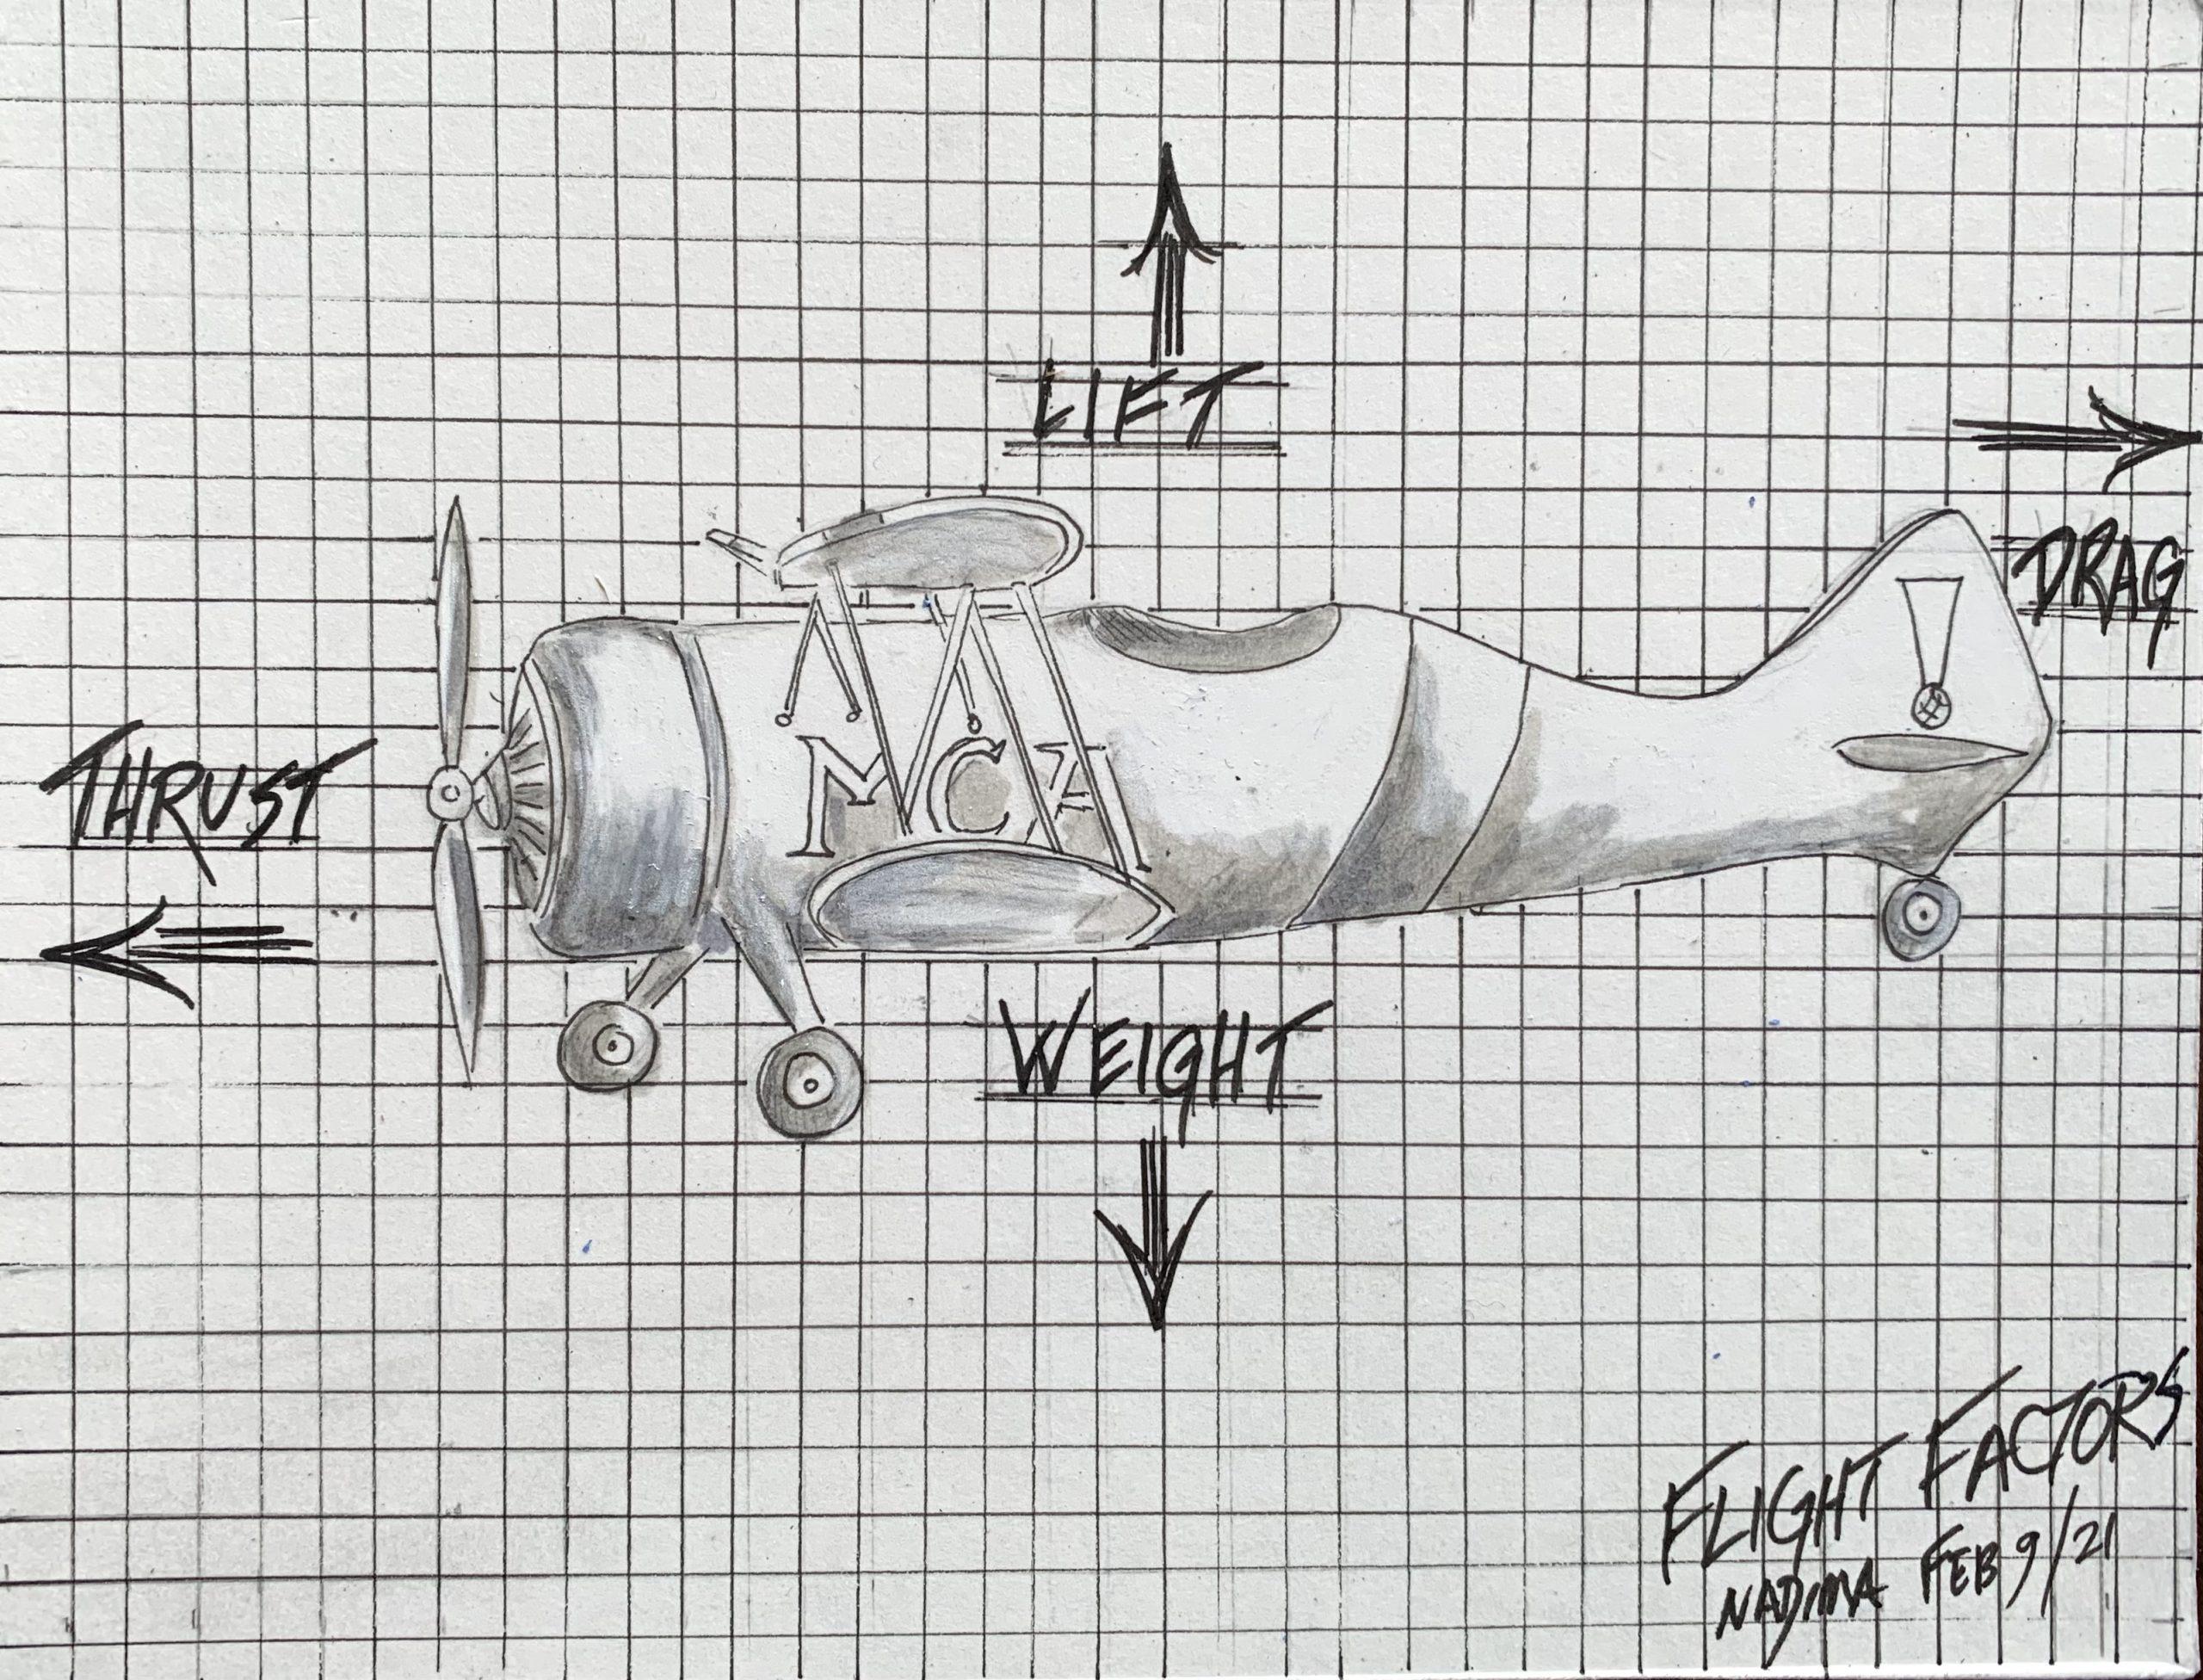 4 flight factors, thrust, drag, weight, lift, bi-plane